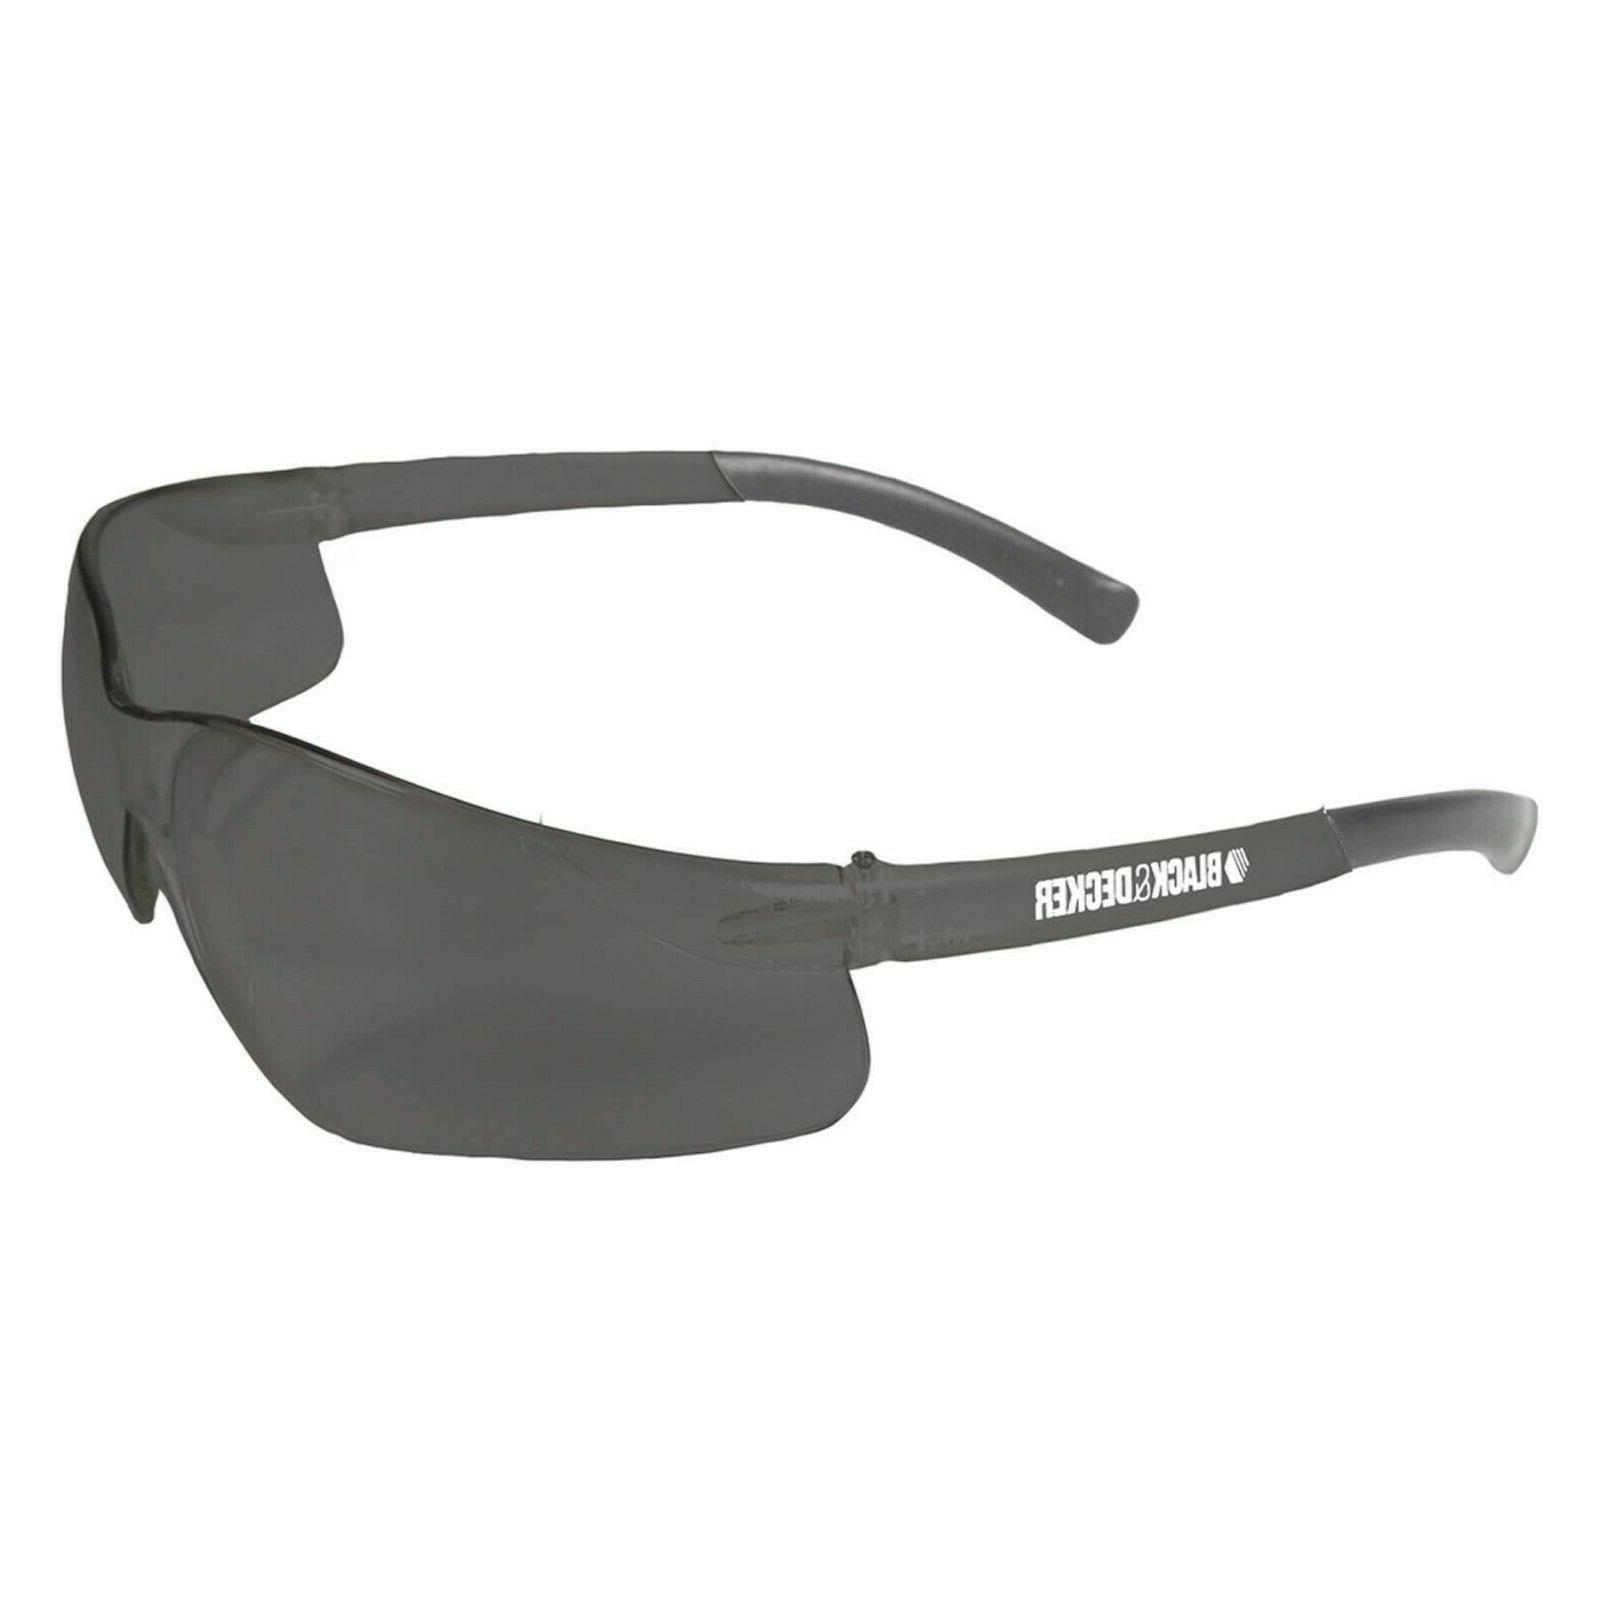 Black & Decker Glasses No Frames Clear OR Smoke Lense